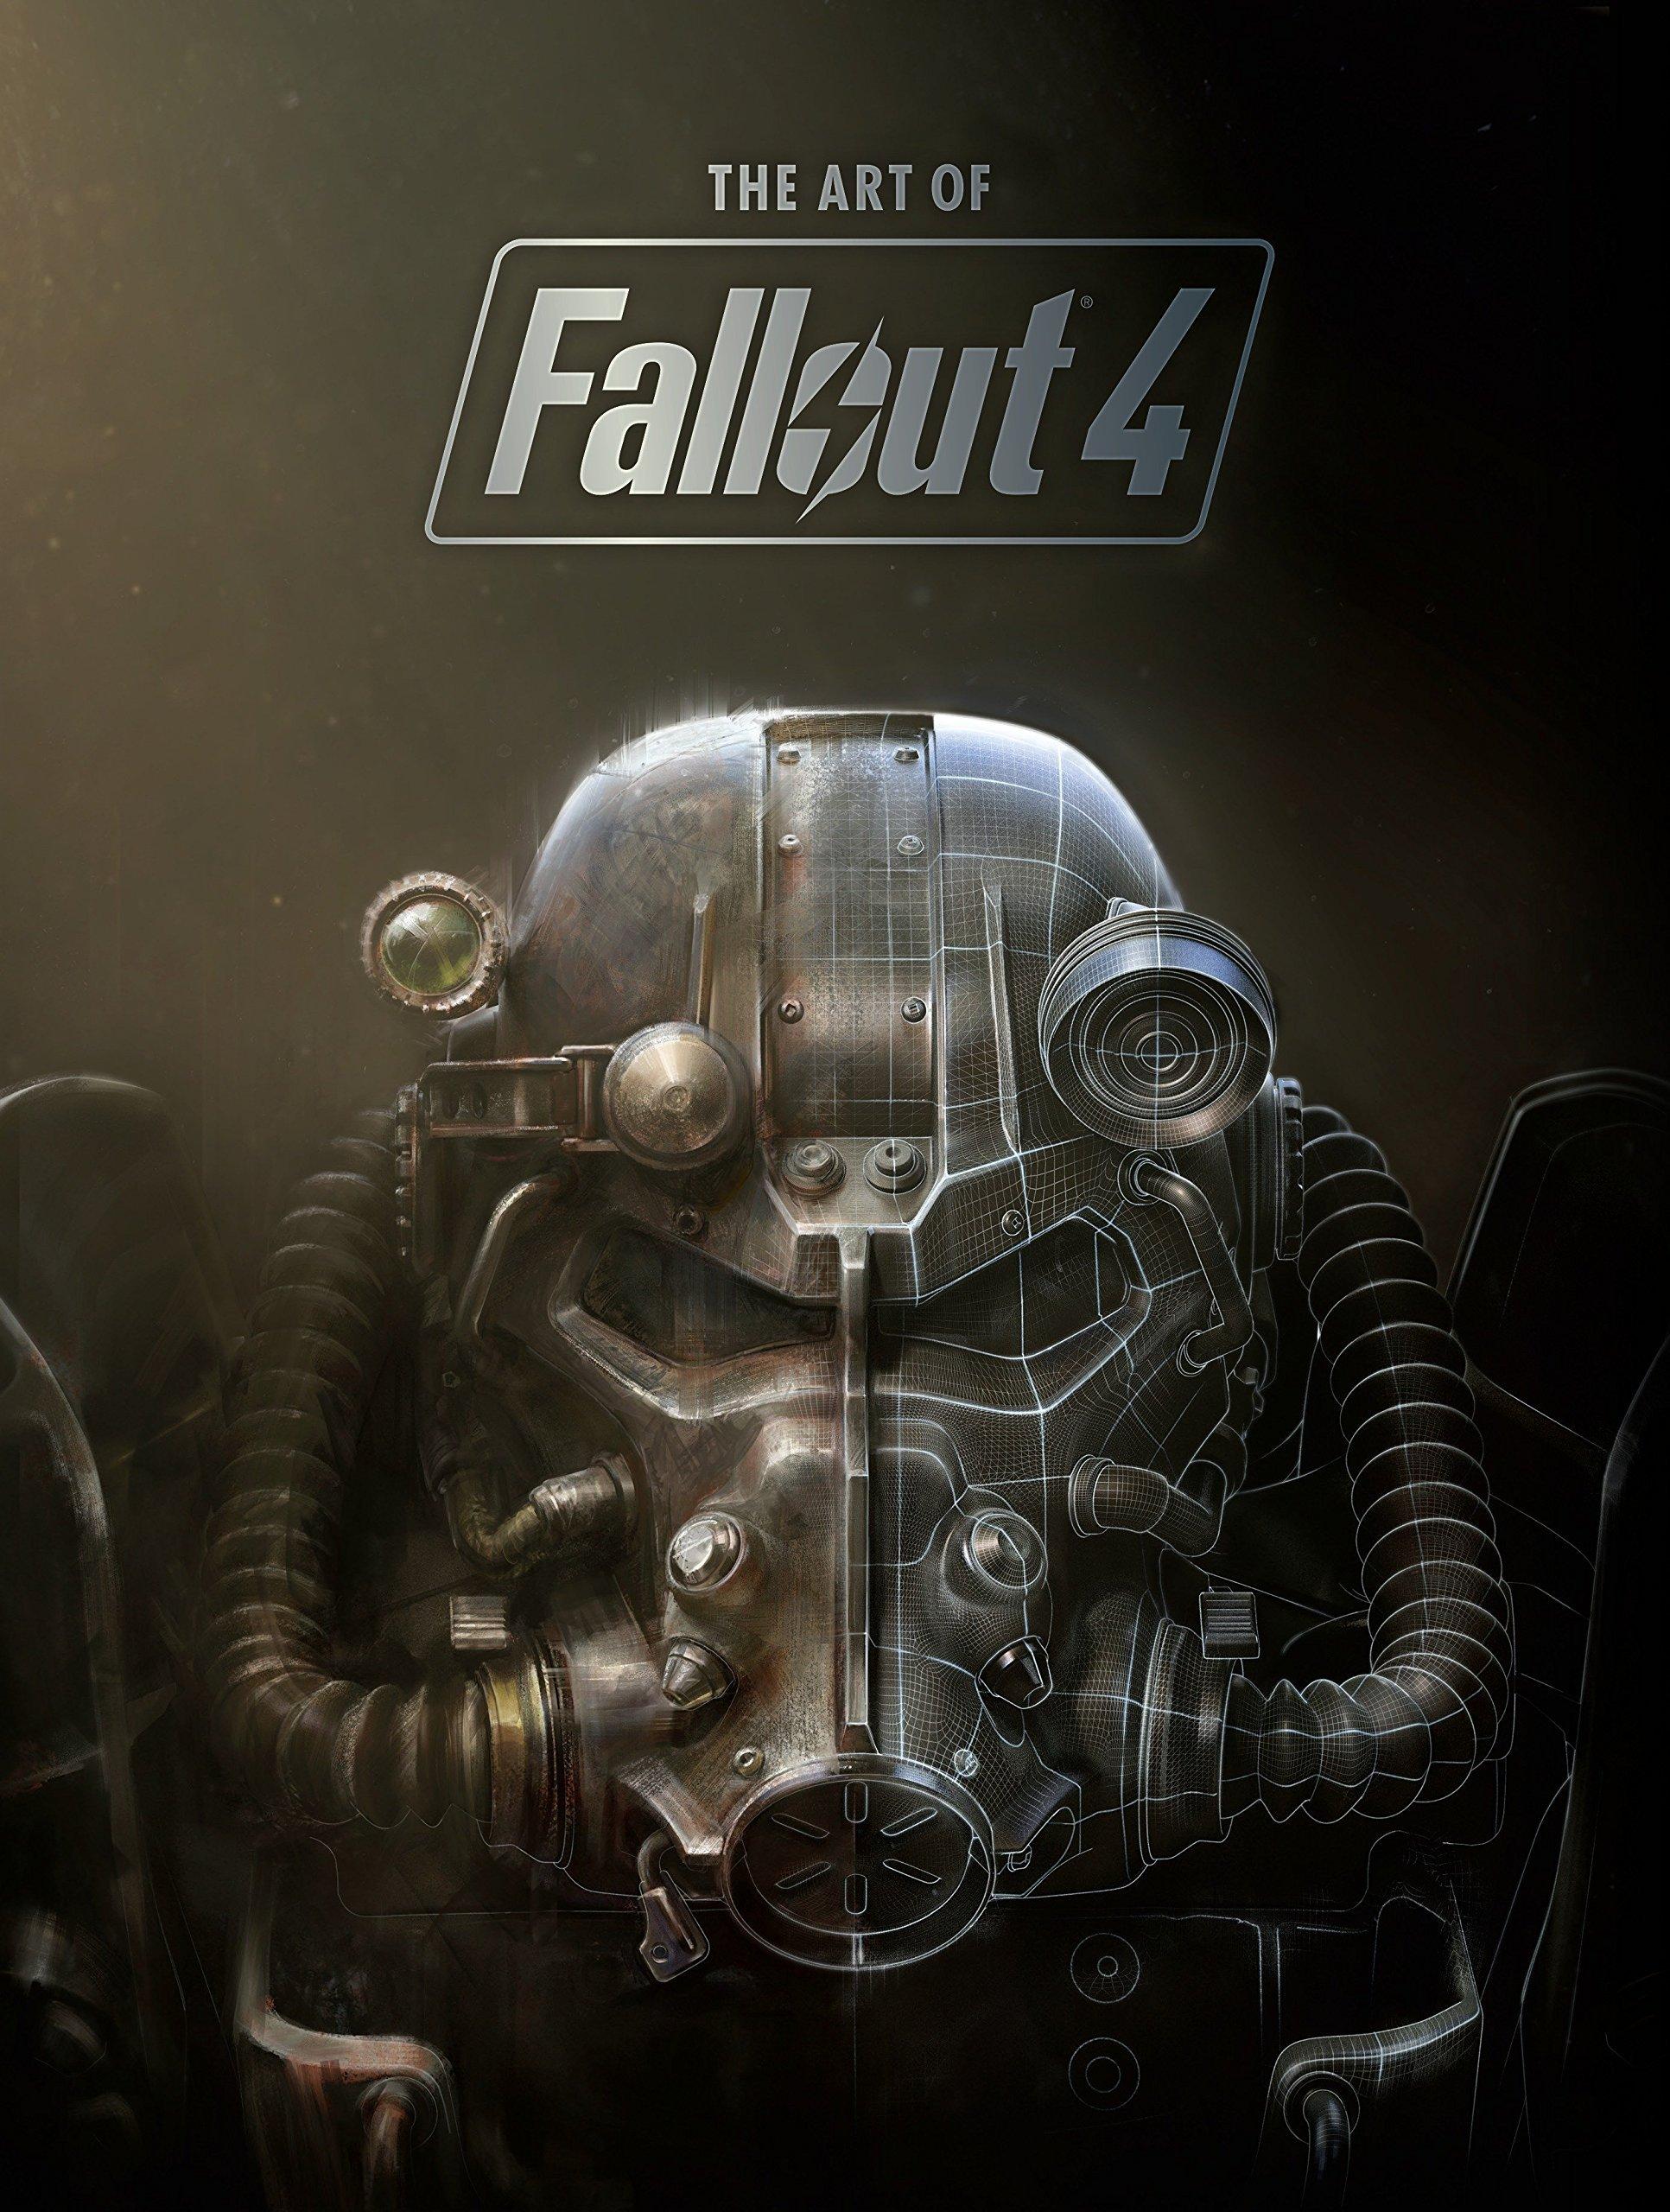 Fallout - The Art of Fallout 4